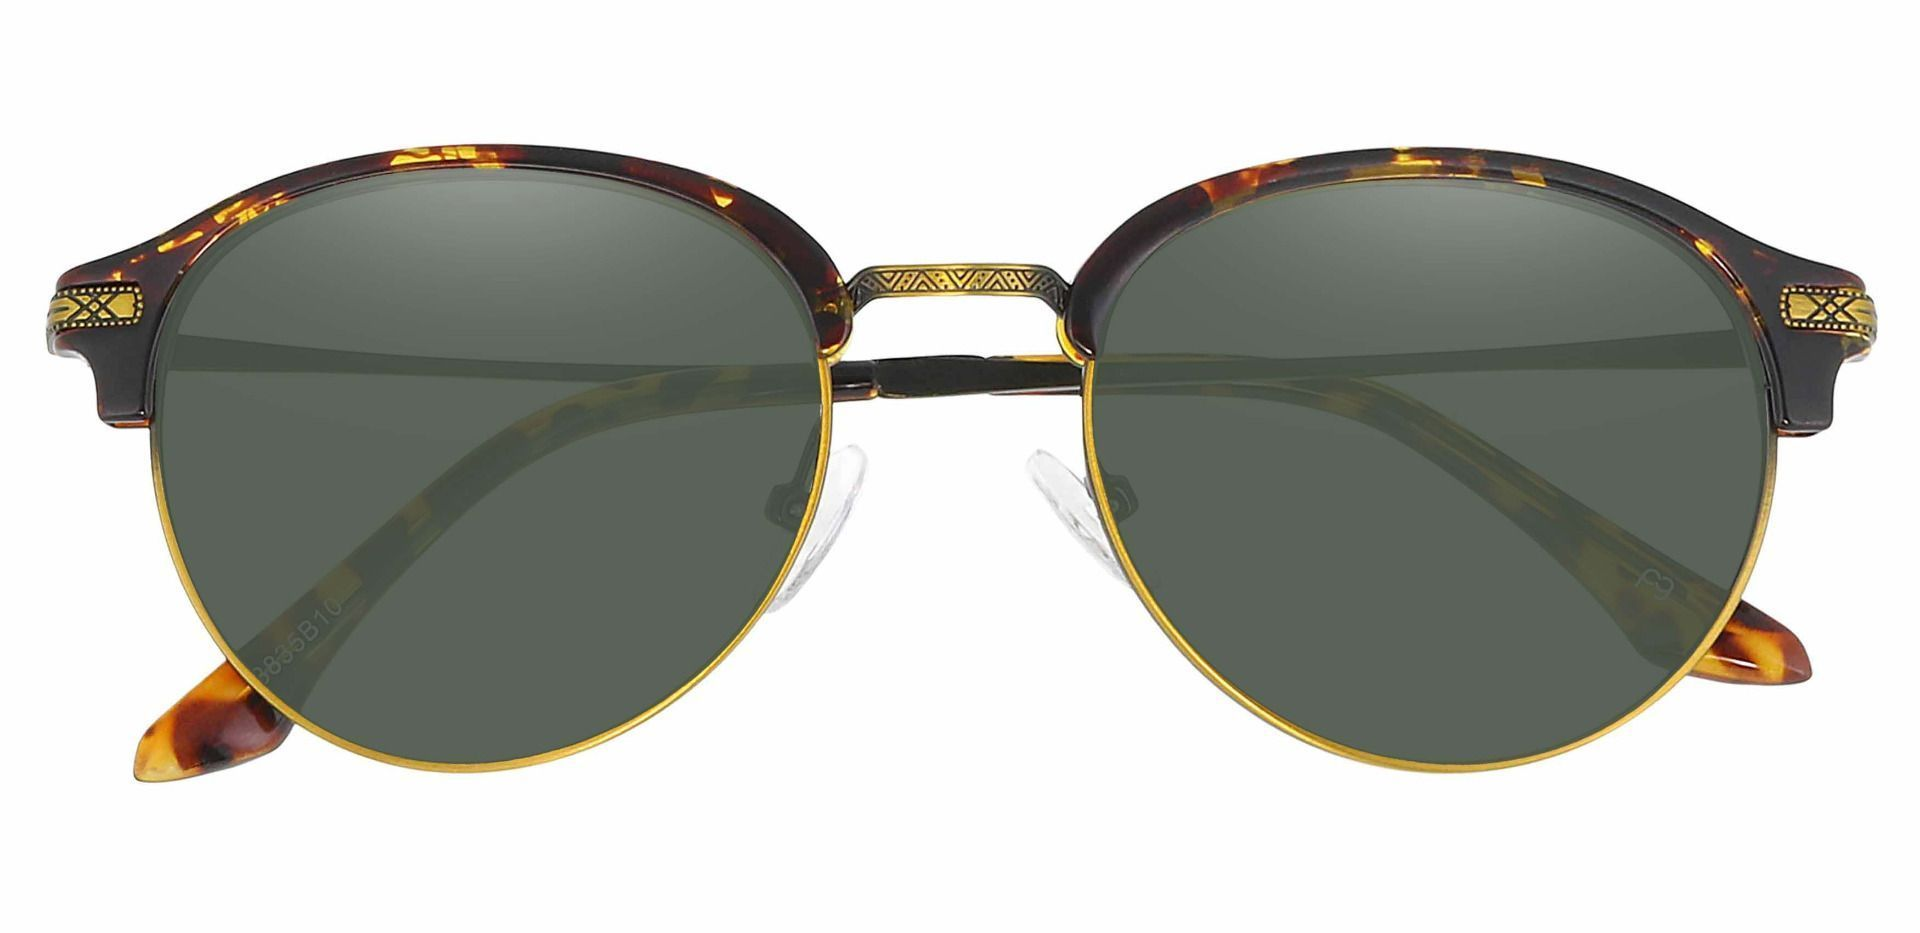 Akron Browline Reading Sunglasses - Tortoise Frame With Green Lenses